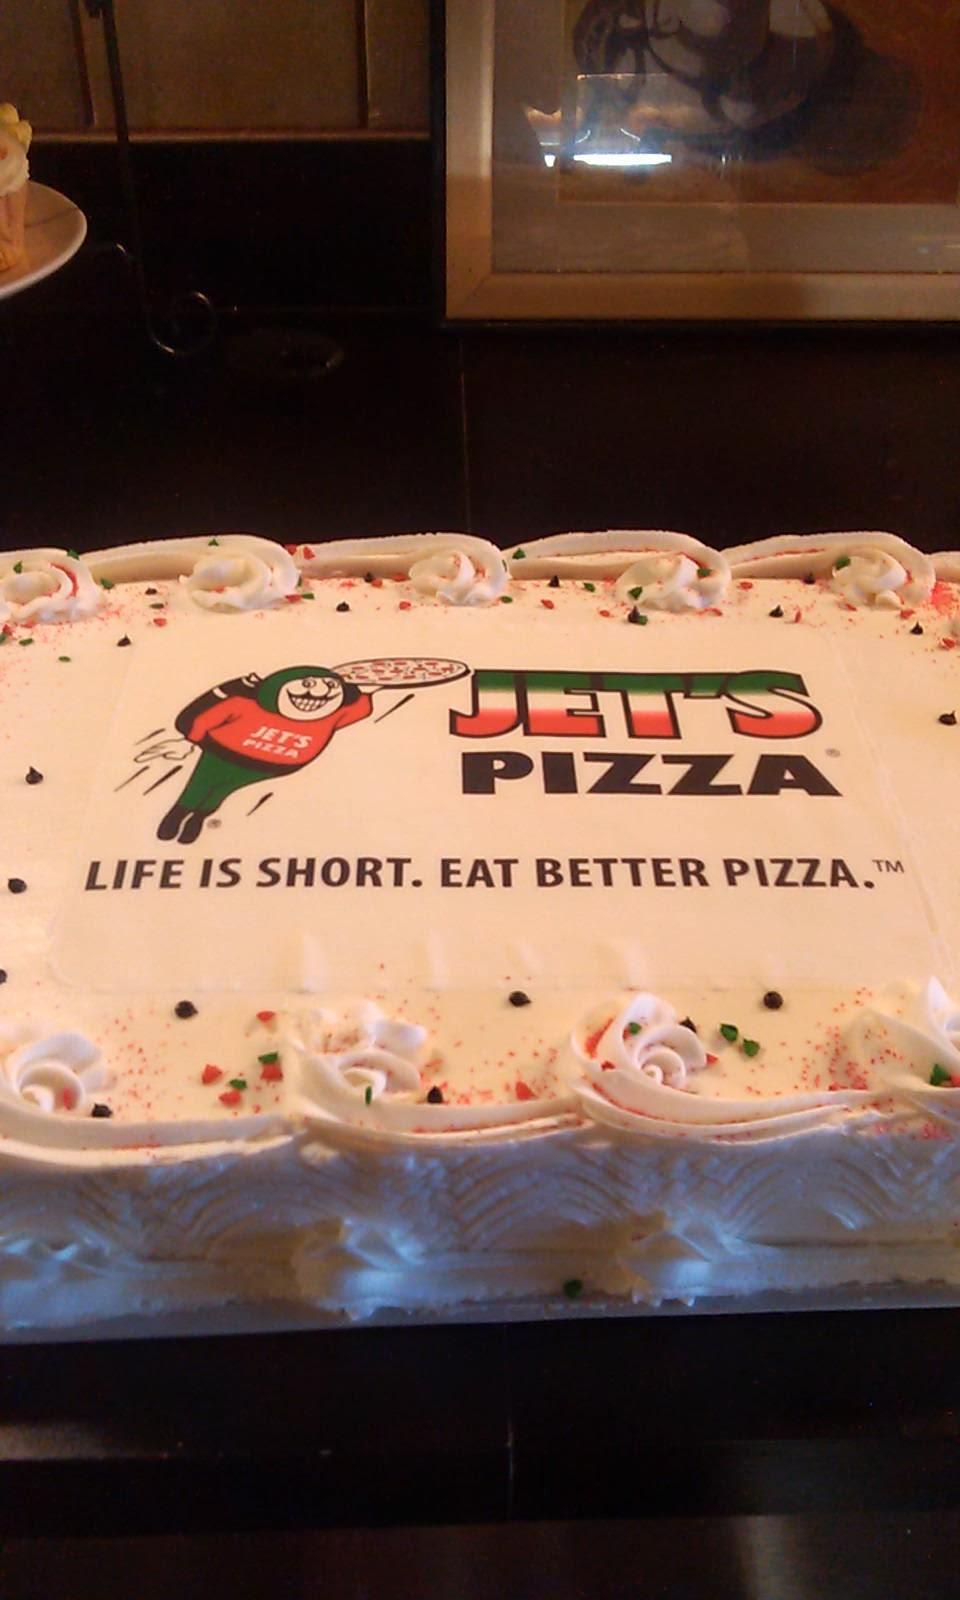 Cake Art Lawrenceville Hwy : CAFE AROMAS: Jet s Pizza Cake